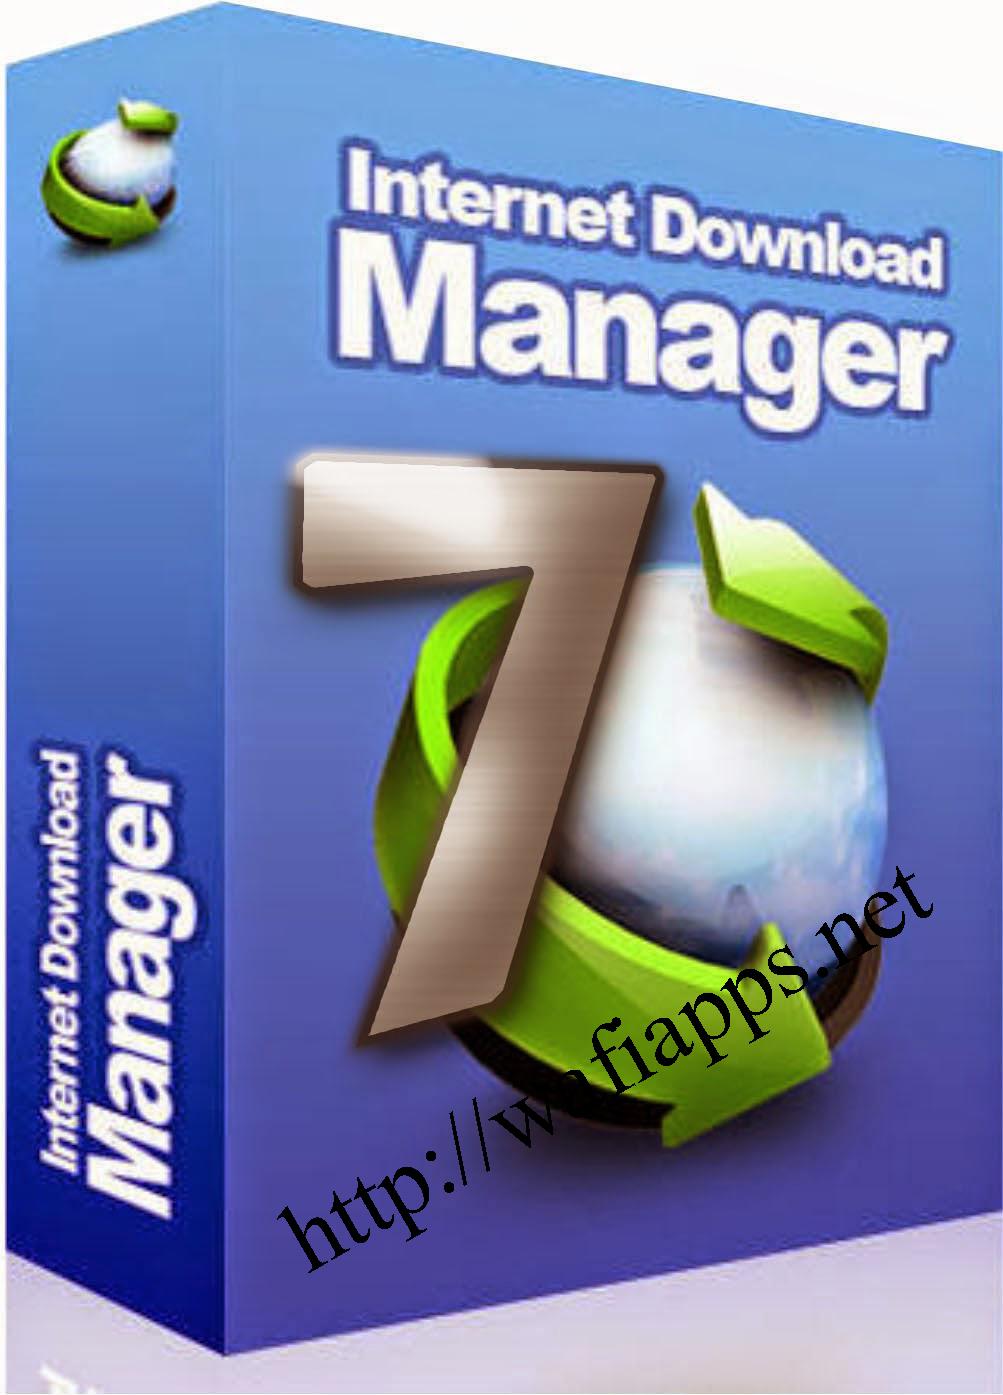 Moldflow viewer download